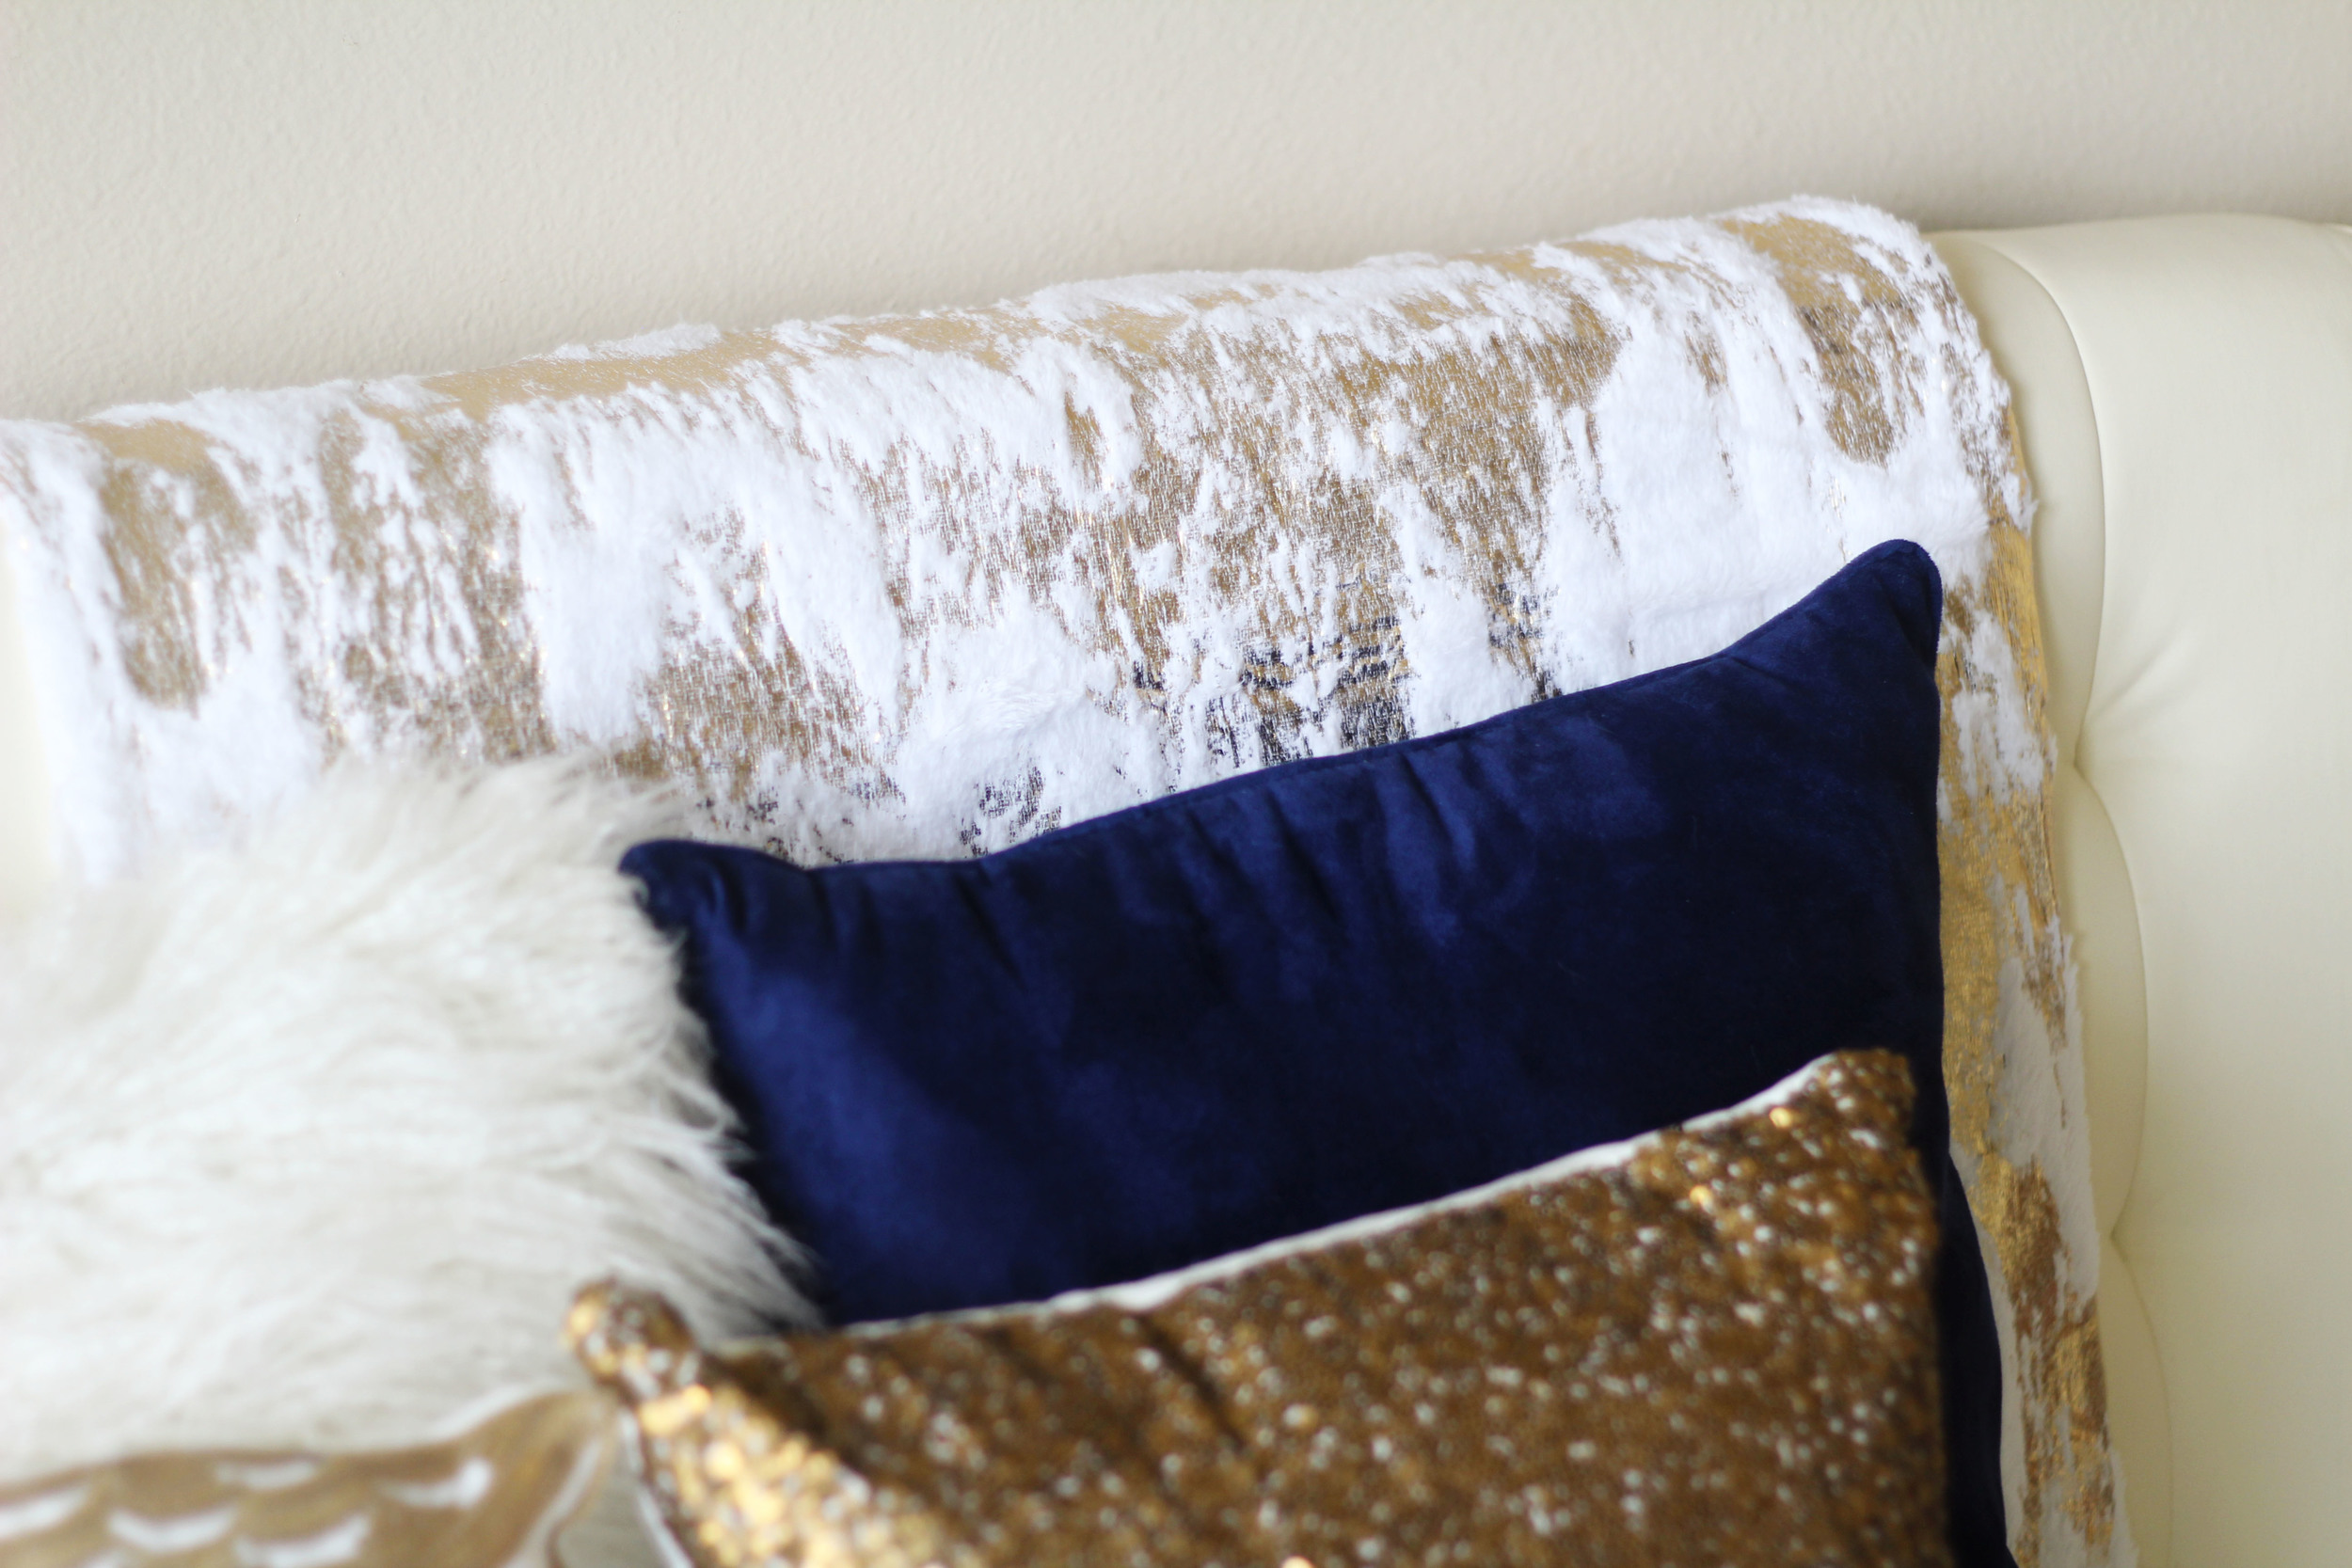 Decorative Fur Throw ($29.99)